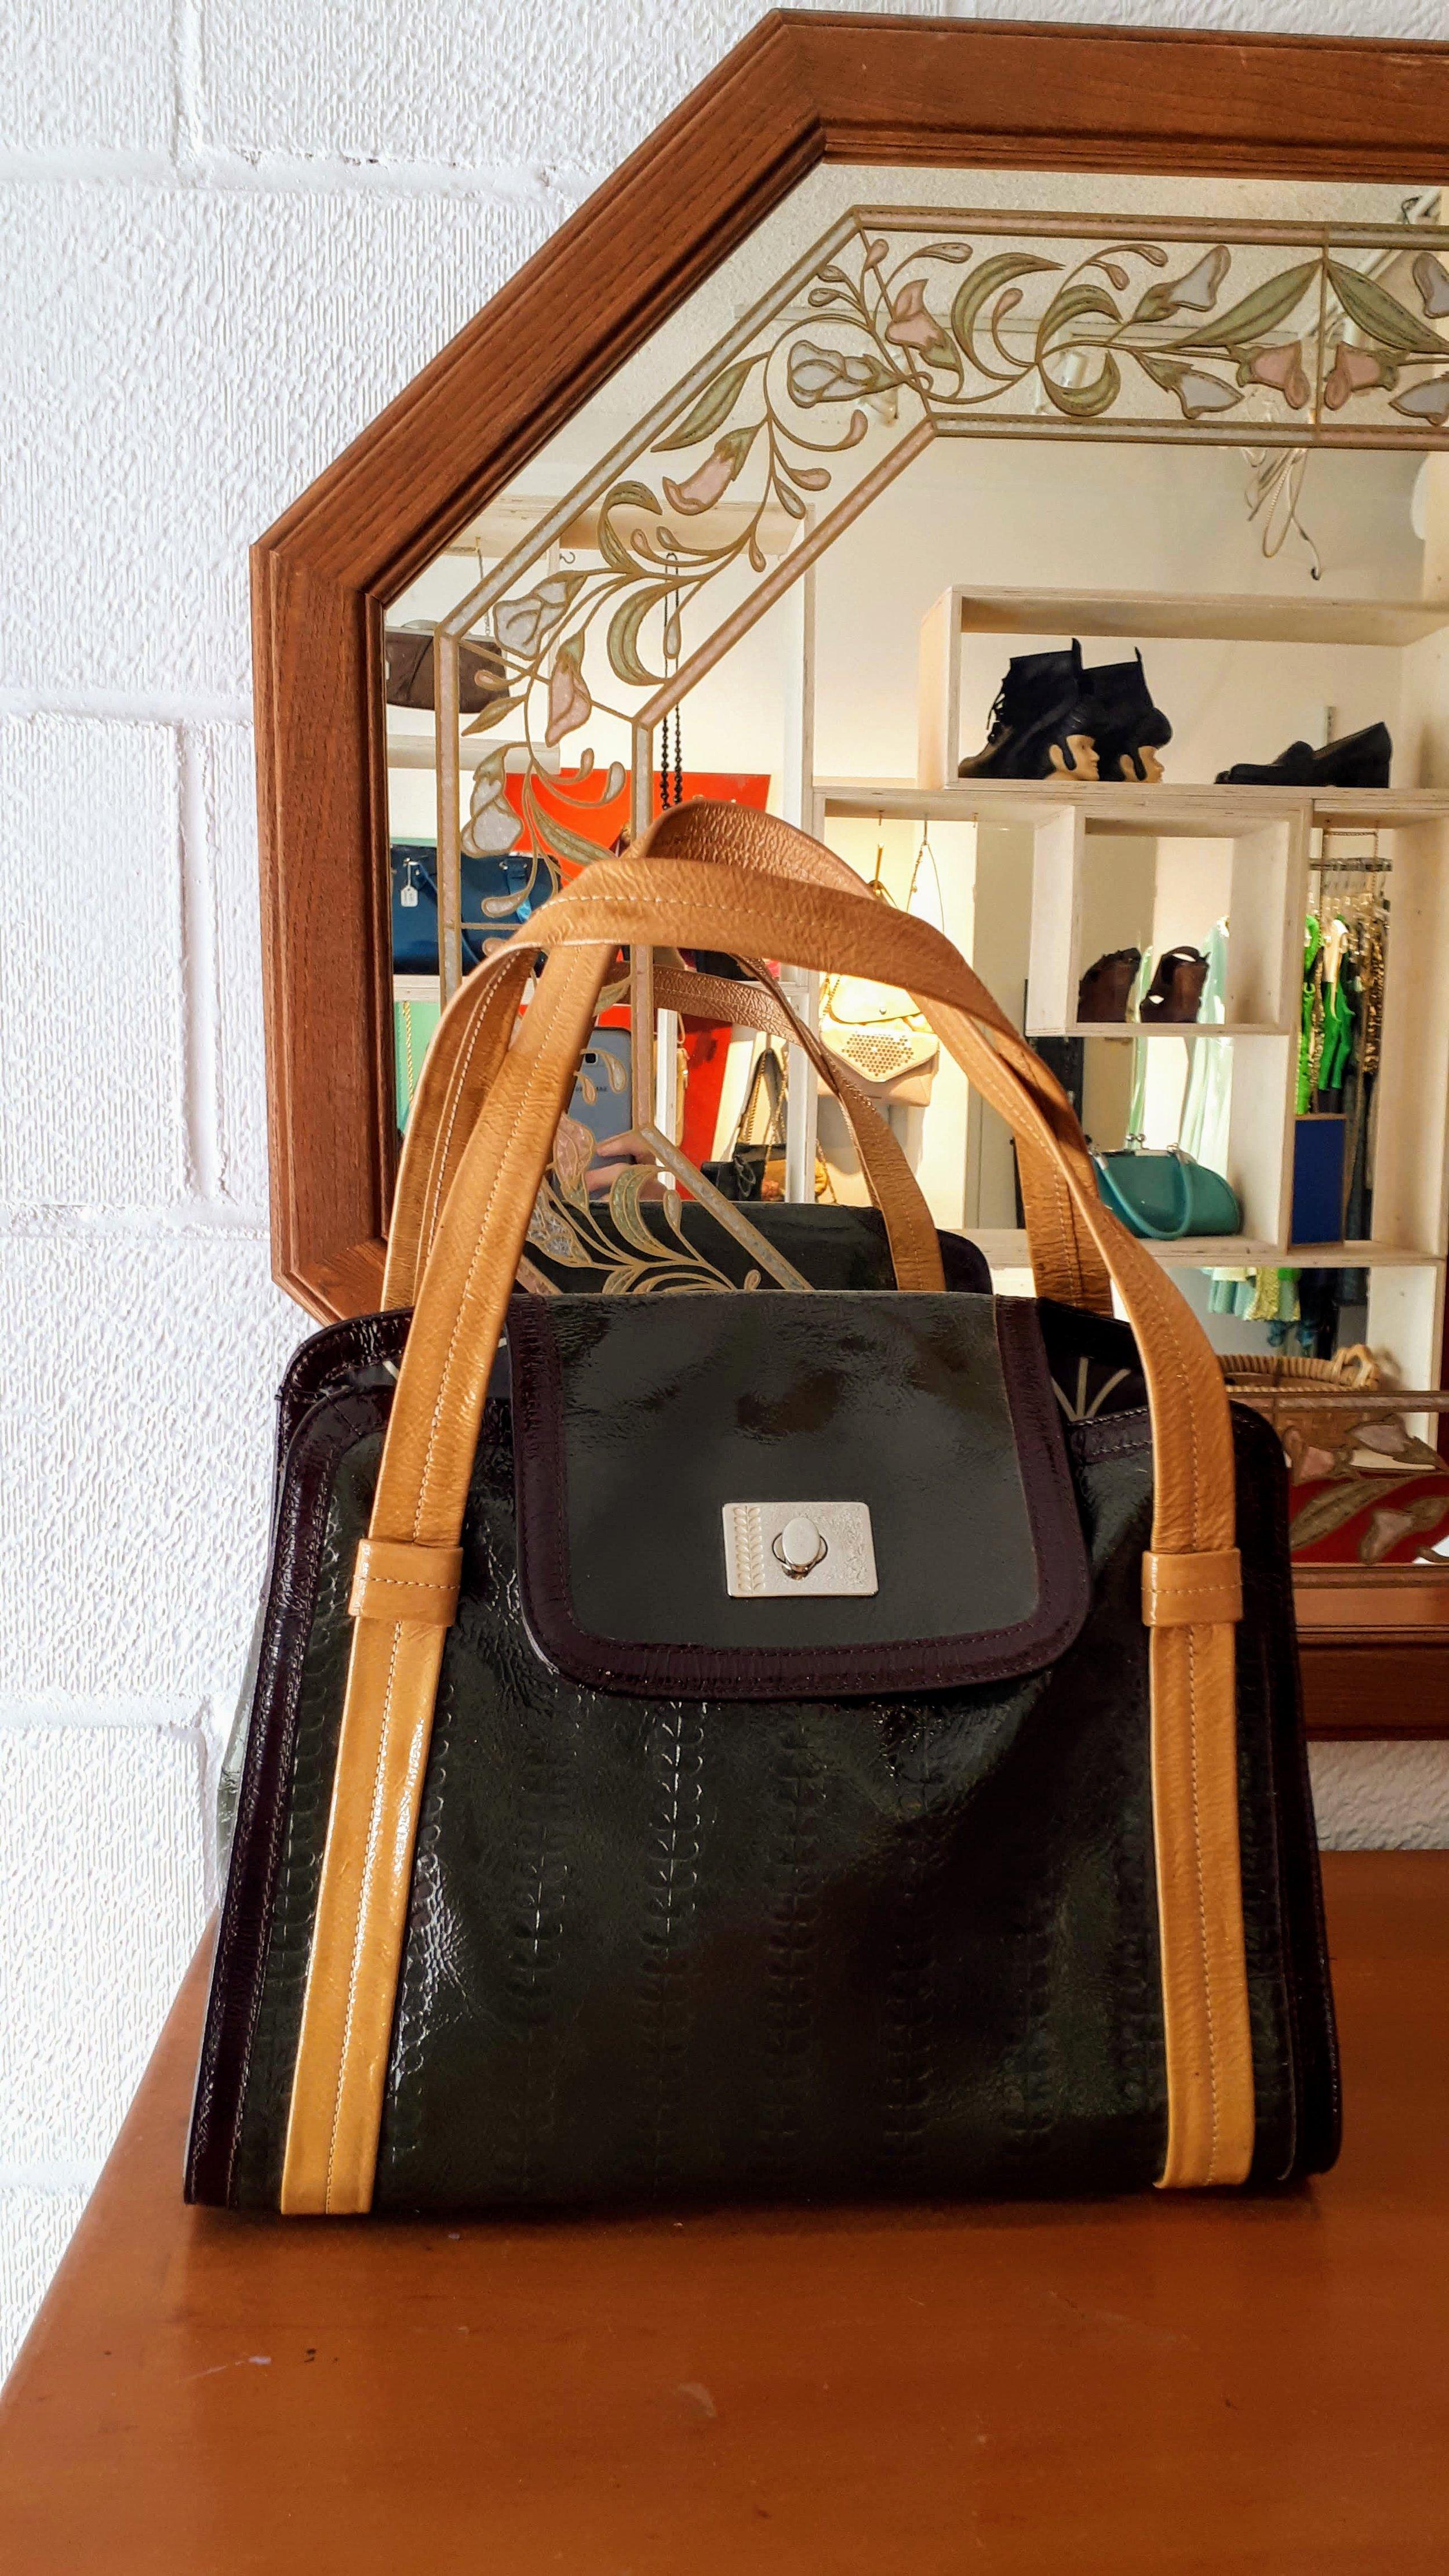 Orla Kiely purse, $95